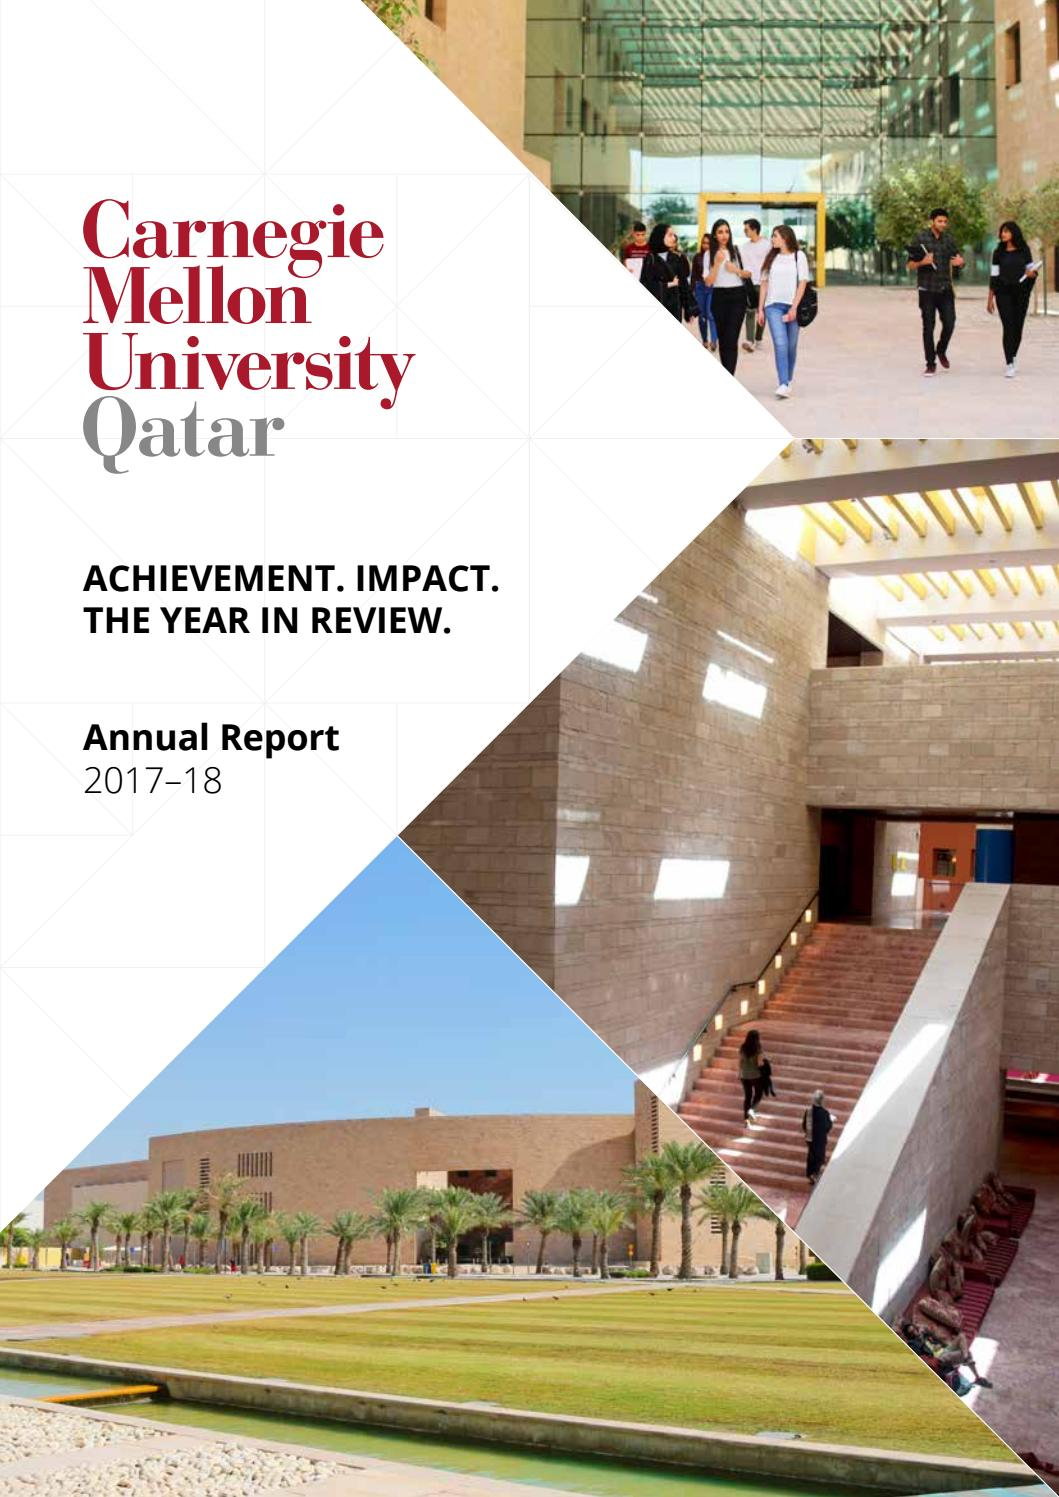 Carnegie Mellon University in Qatar's Annual Report for 2017